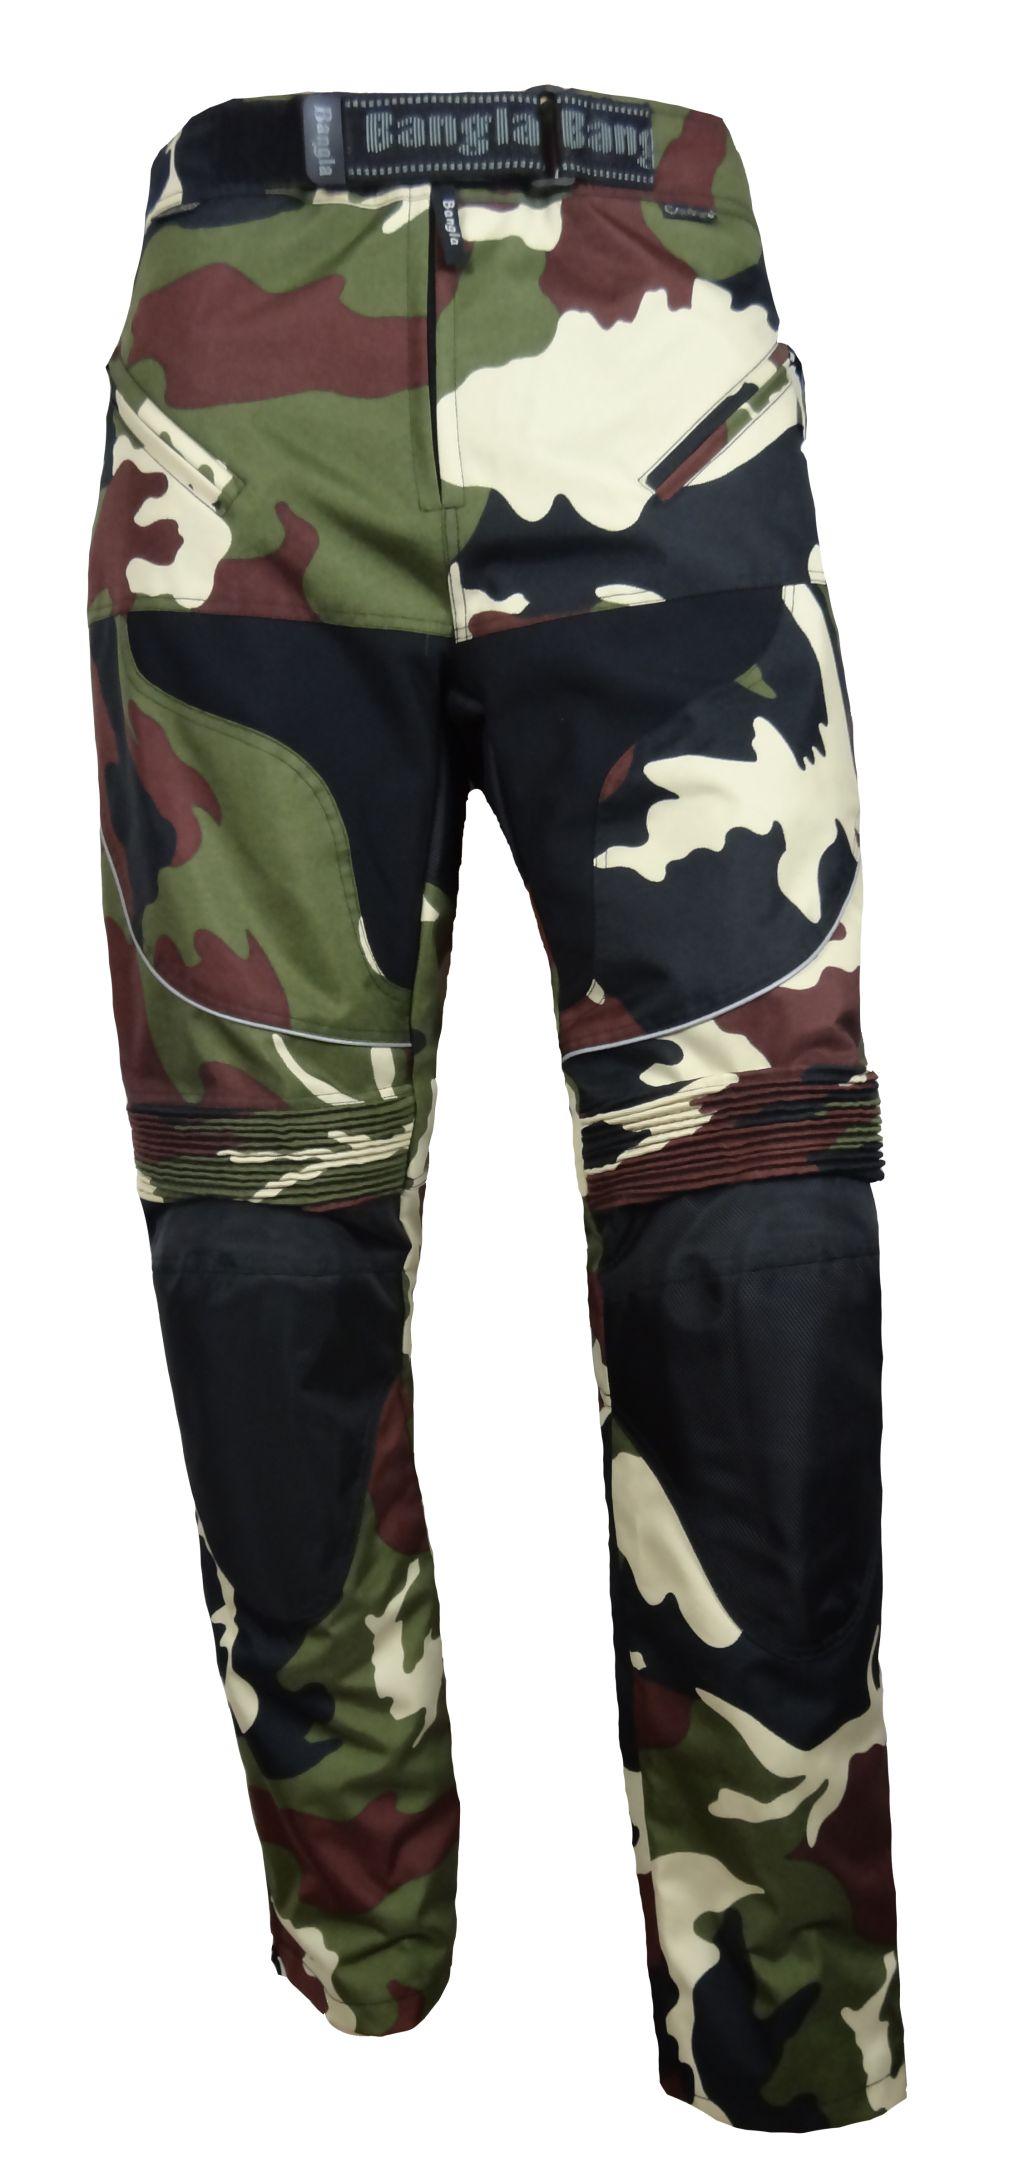 Motorradhose Herren Tourenhose Bangla Camouflage Gruen S bis 7 XL